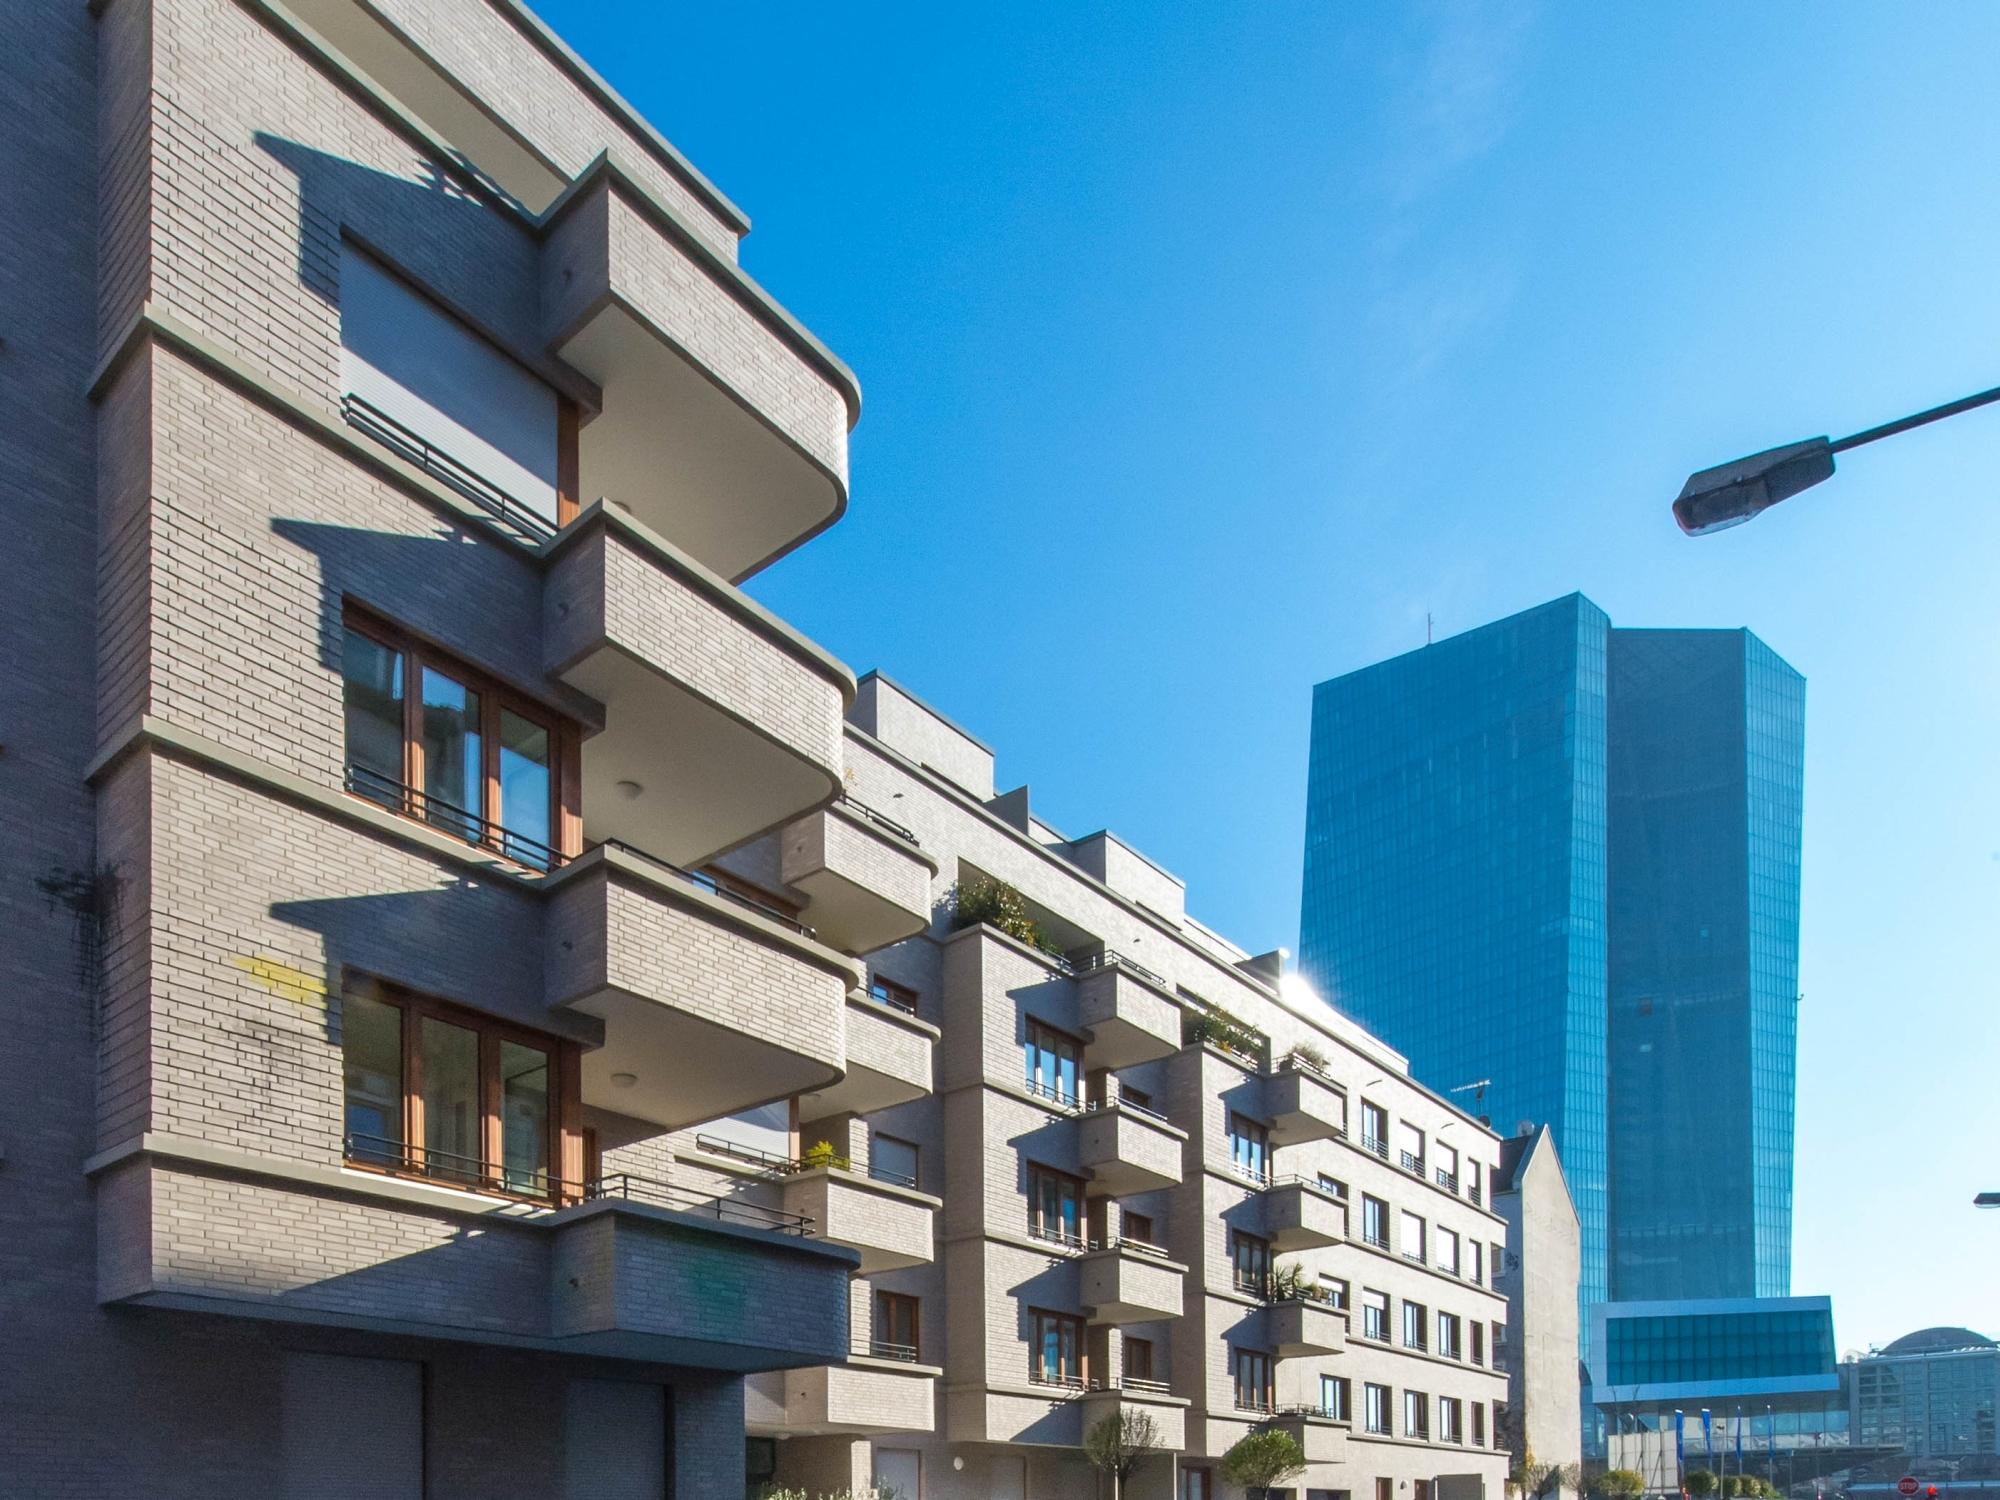 architekten in frankfurt hauswalter with architekten in frankfurt hotel the grey zimmer hotels. Black Bedroom Furniture Sets. Home Design Ideas